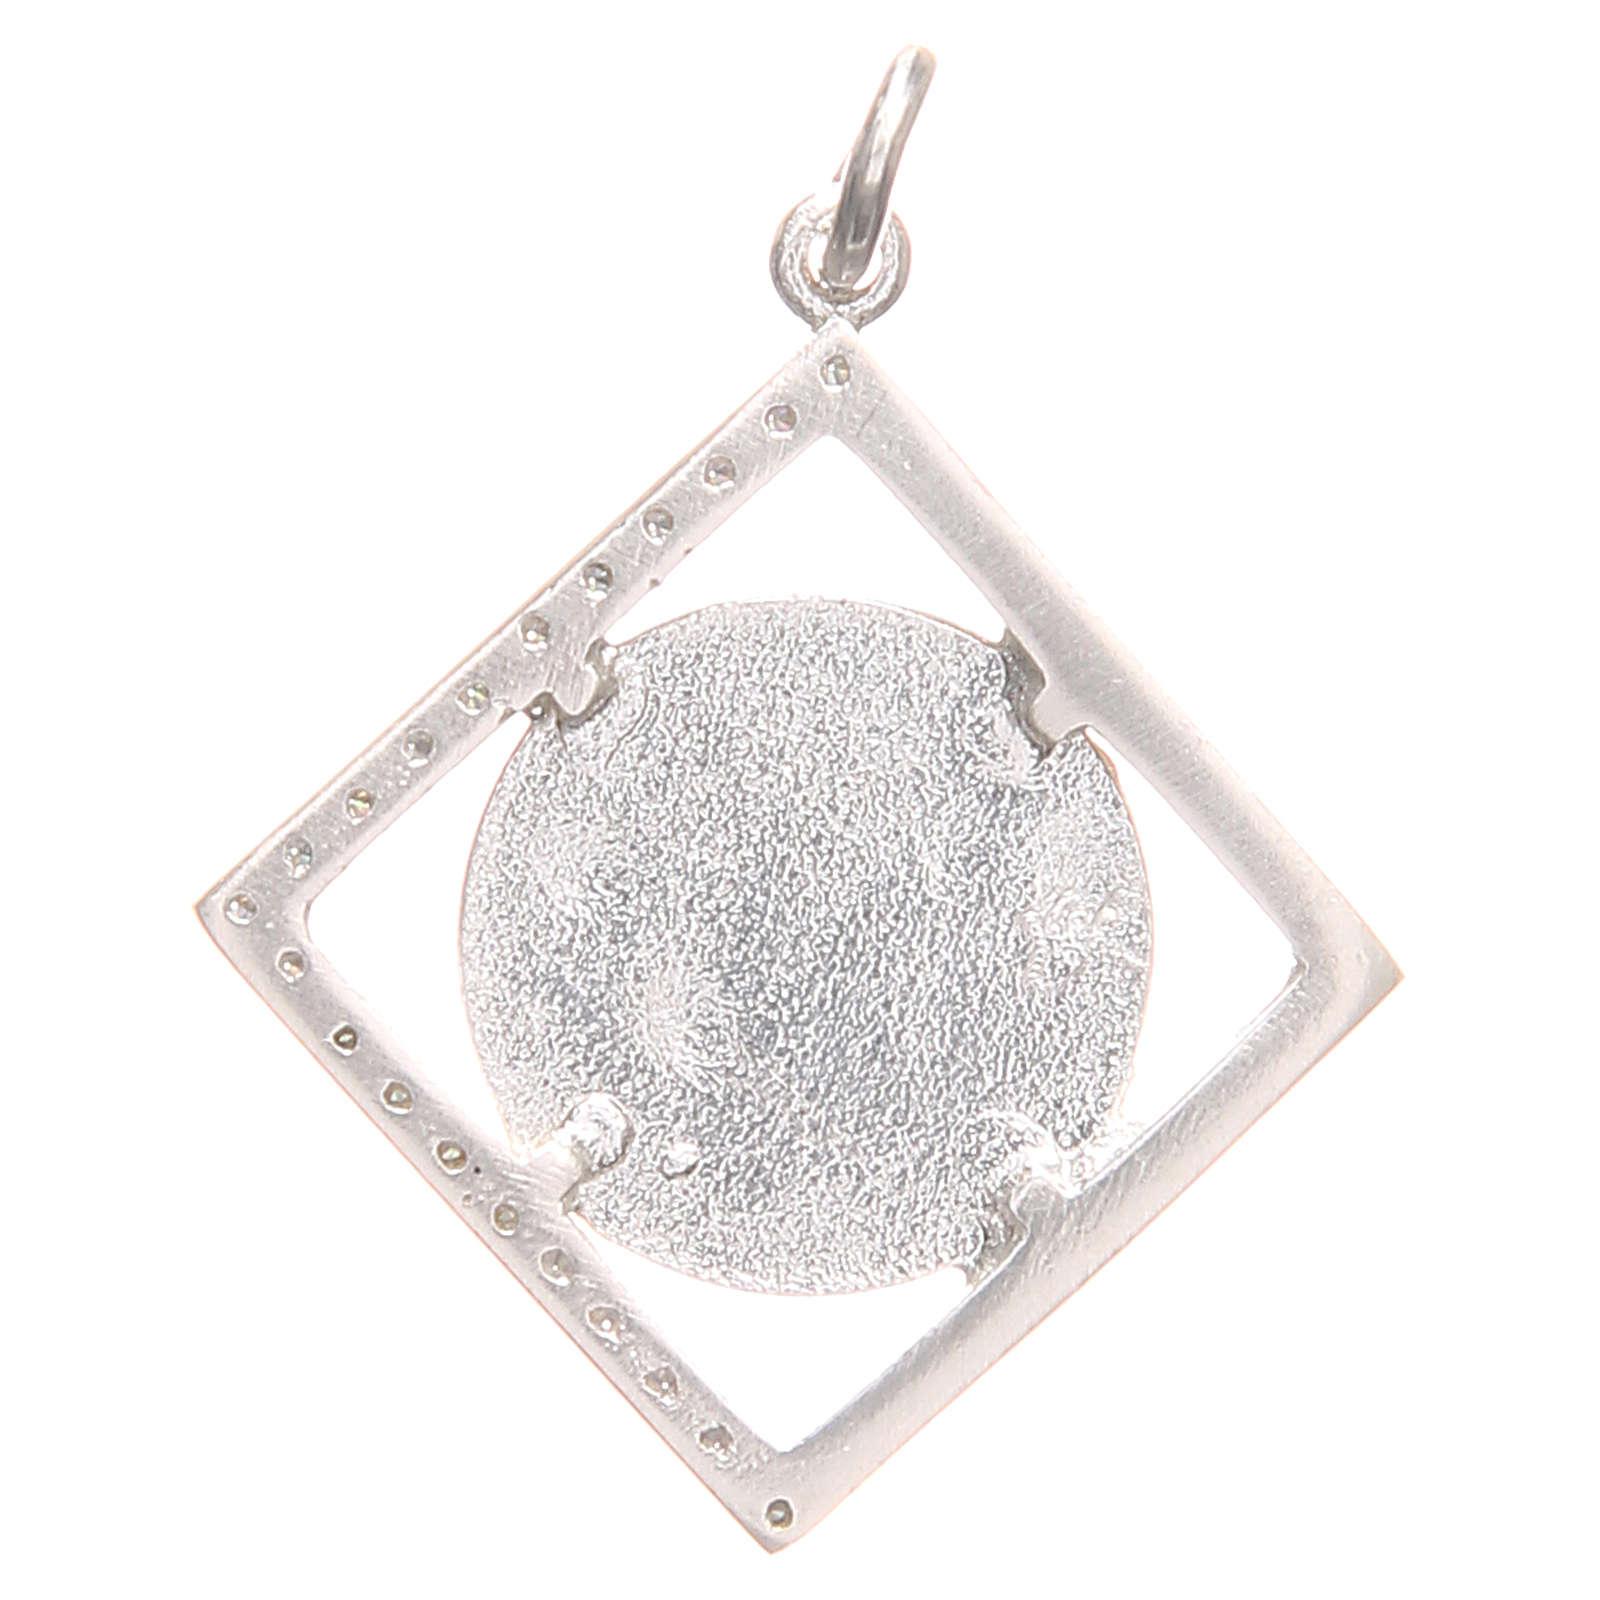 Pingente prata 925 Nossa Senhora Lourdes 1,5x1,5 cm 4